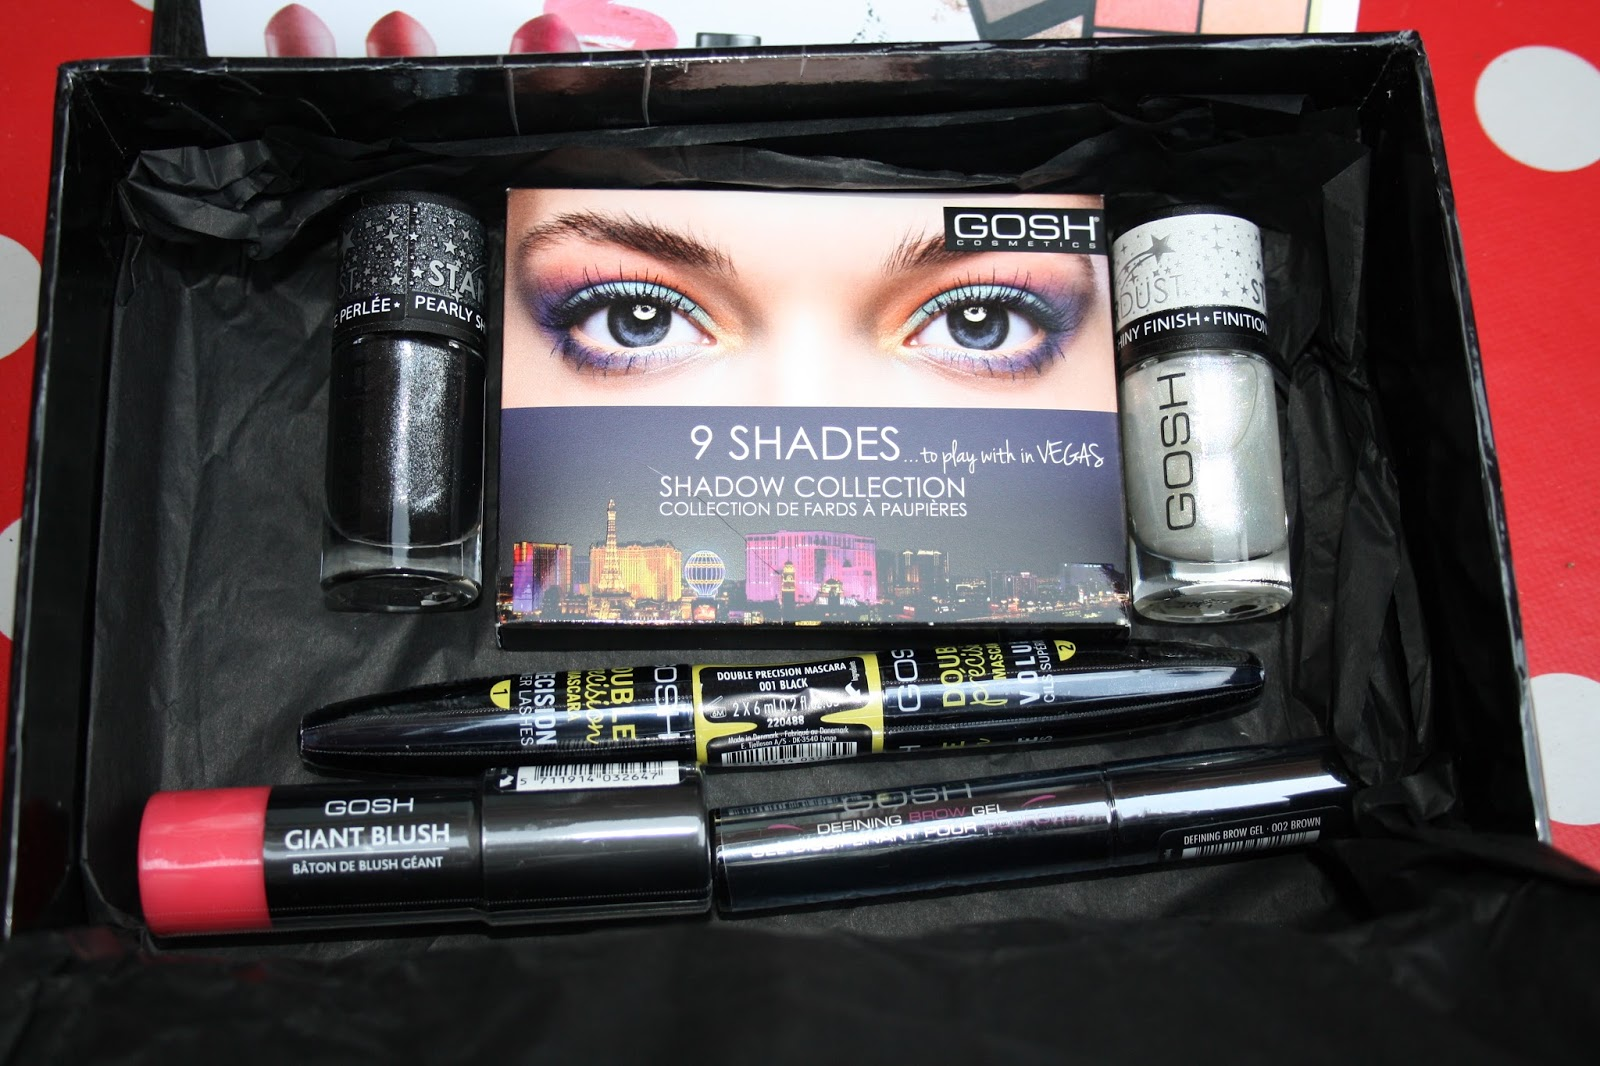 GOSH Cosmetics AW14 range